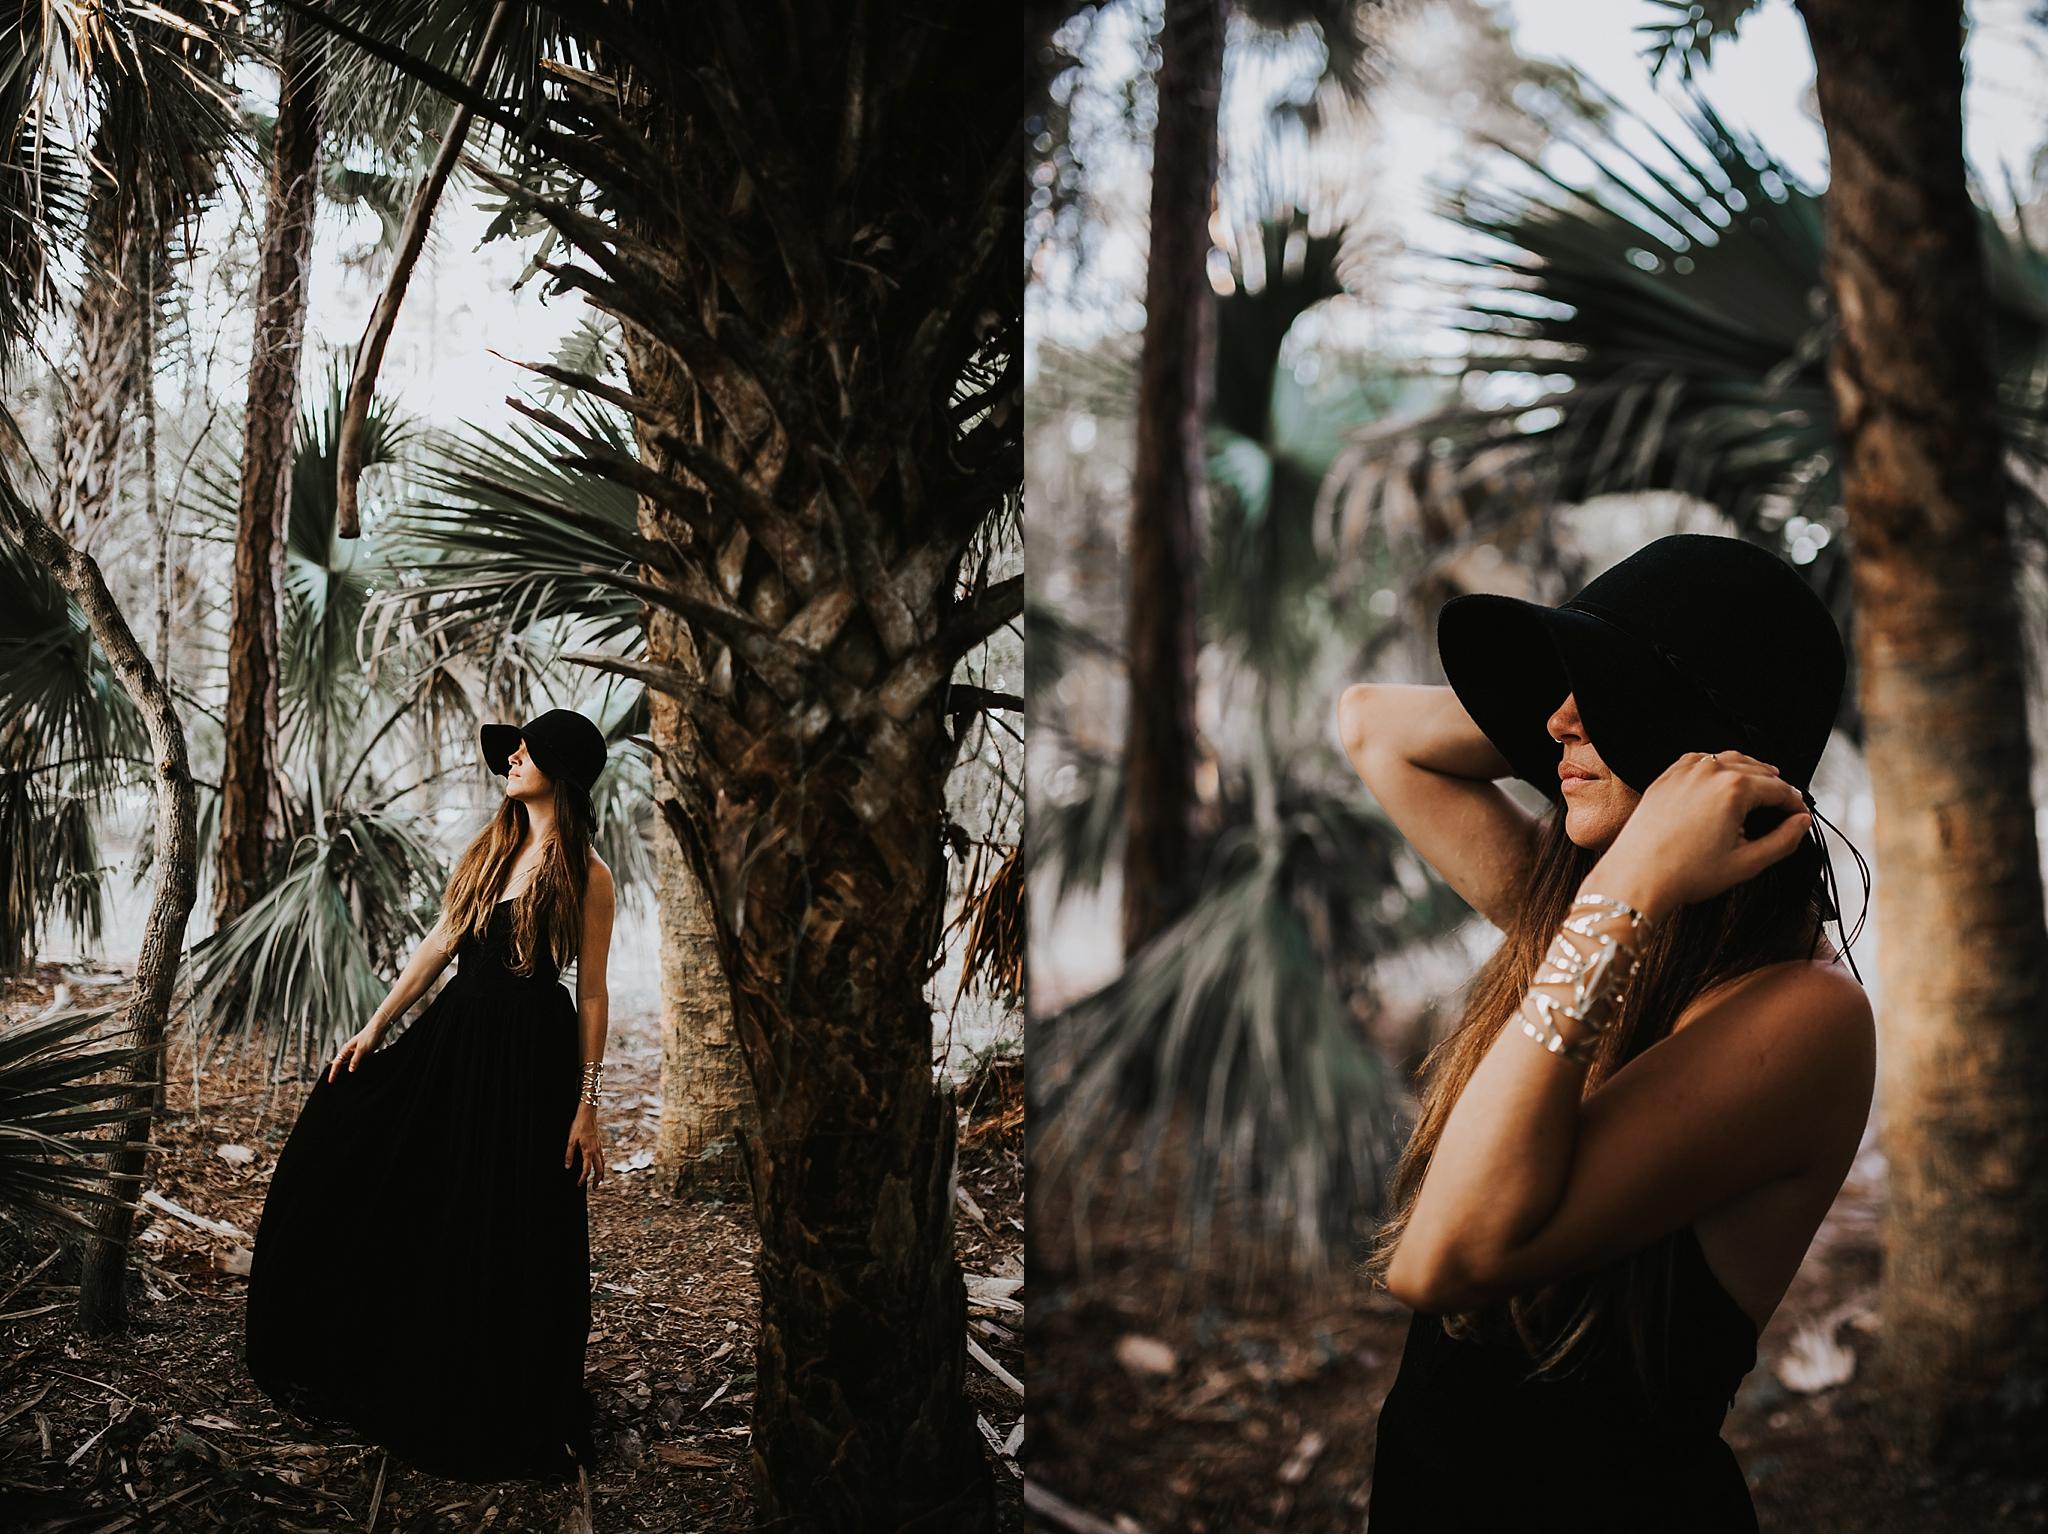 twyla jones photography - treasure coast - florida family photography riverbend park jupiter florida-5895.jpg